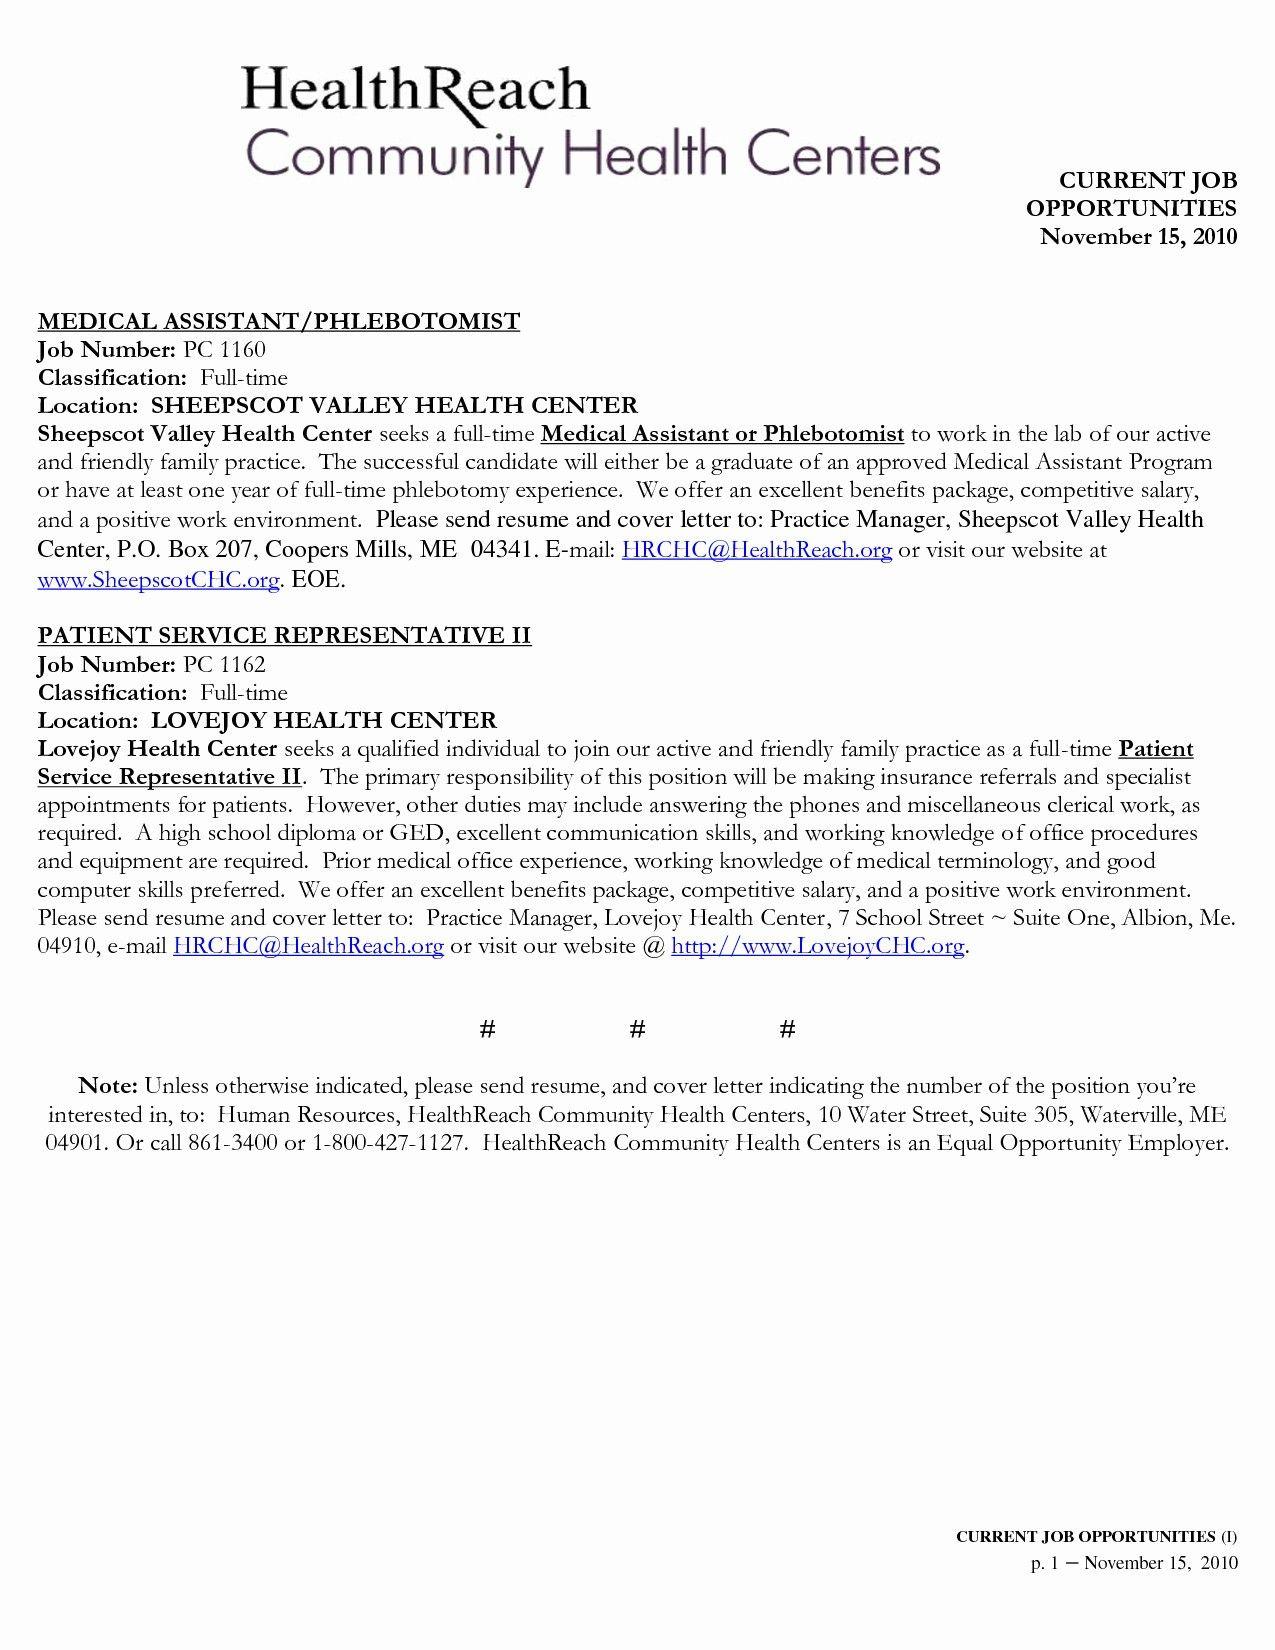 27 phlebotomist cover letter in 2020 cover letter for